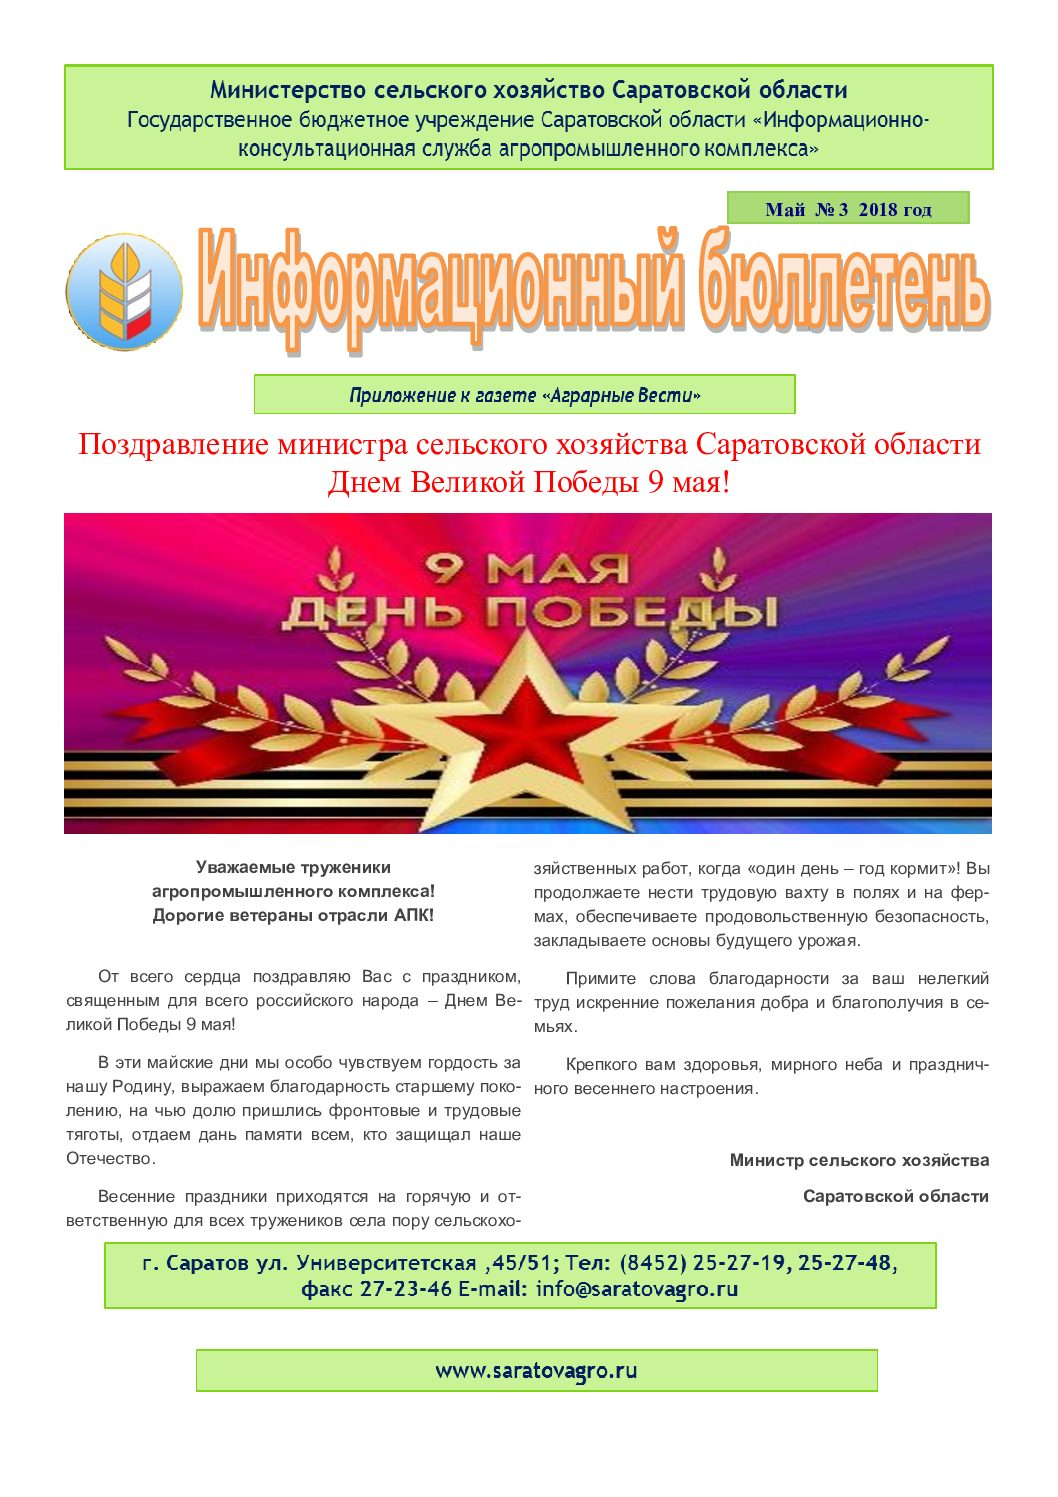 https://saratovagro.ru/wp-content/uploads/2020/08/3.2018-1-pdf.jpg